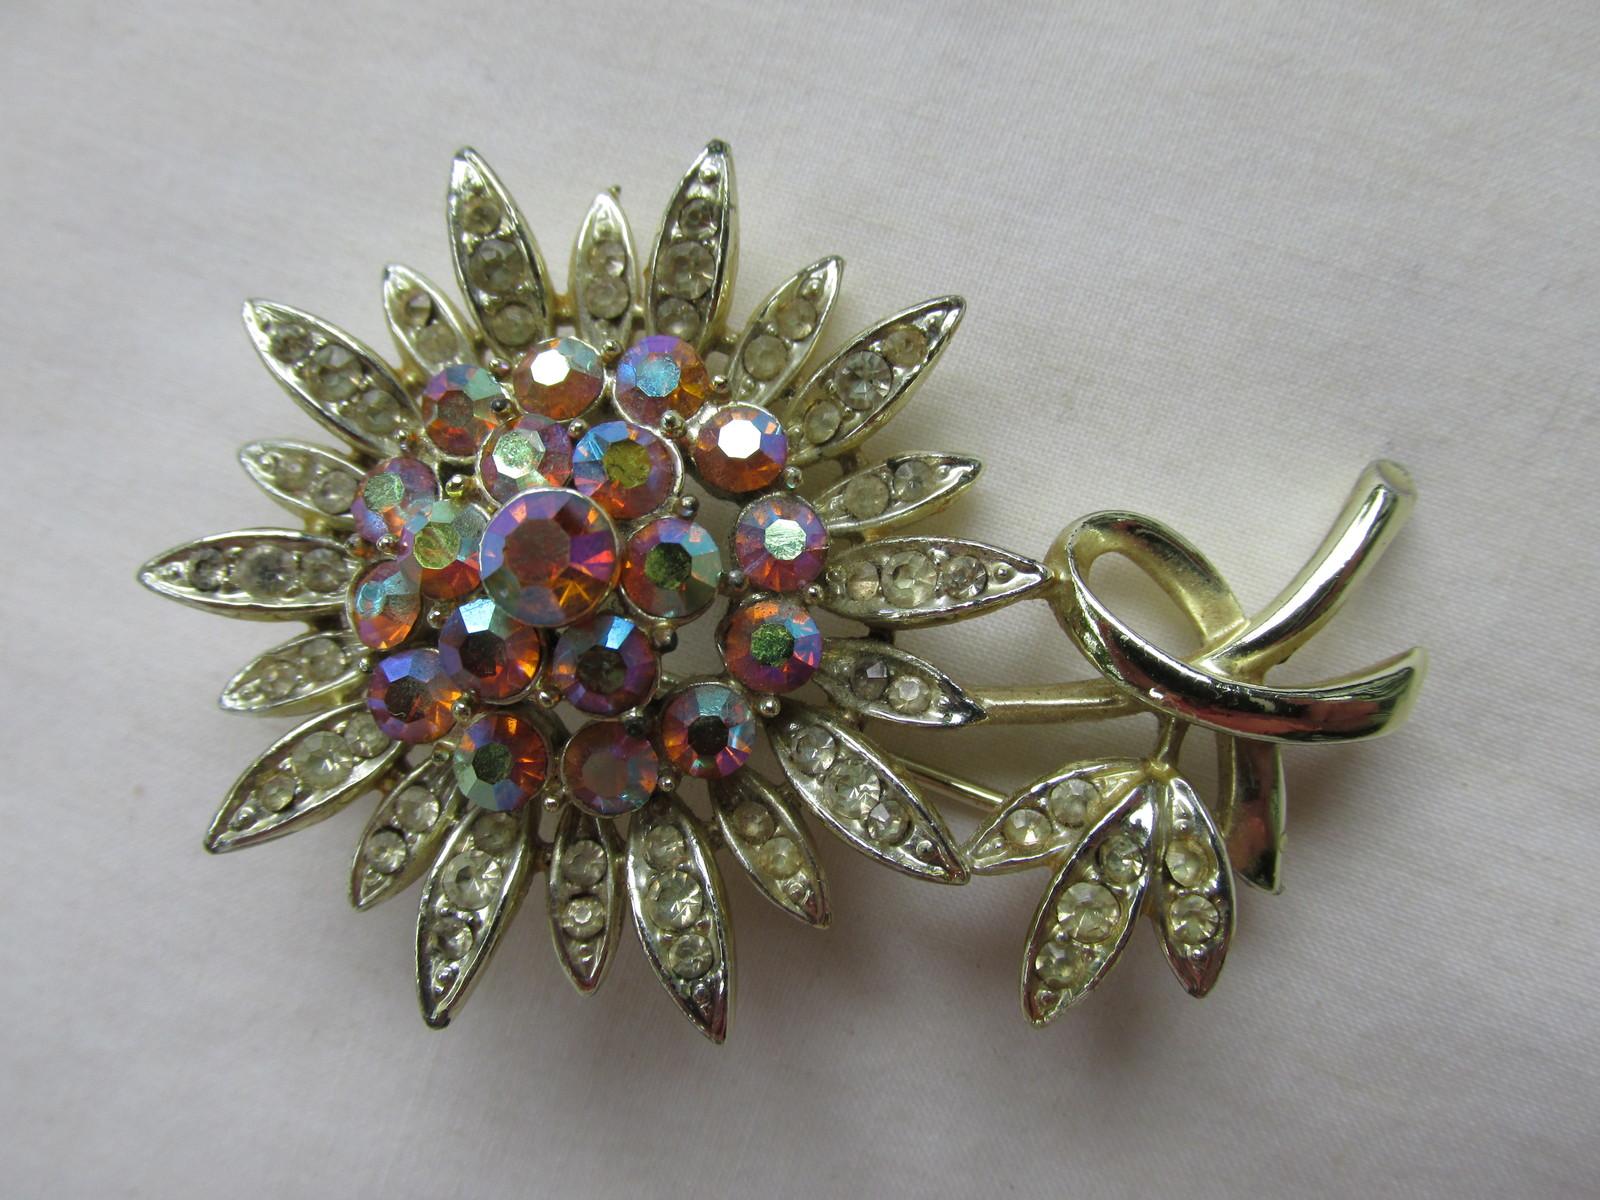 Vintage Francois (Coro) Aurora Borealis Flower Pin / Brooch, 1930s - 1960